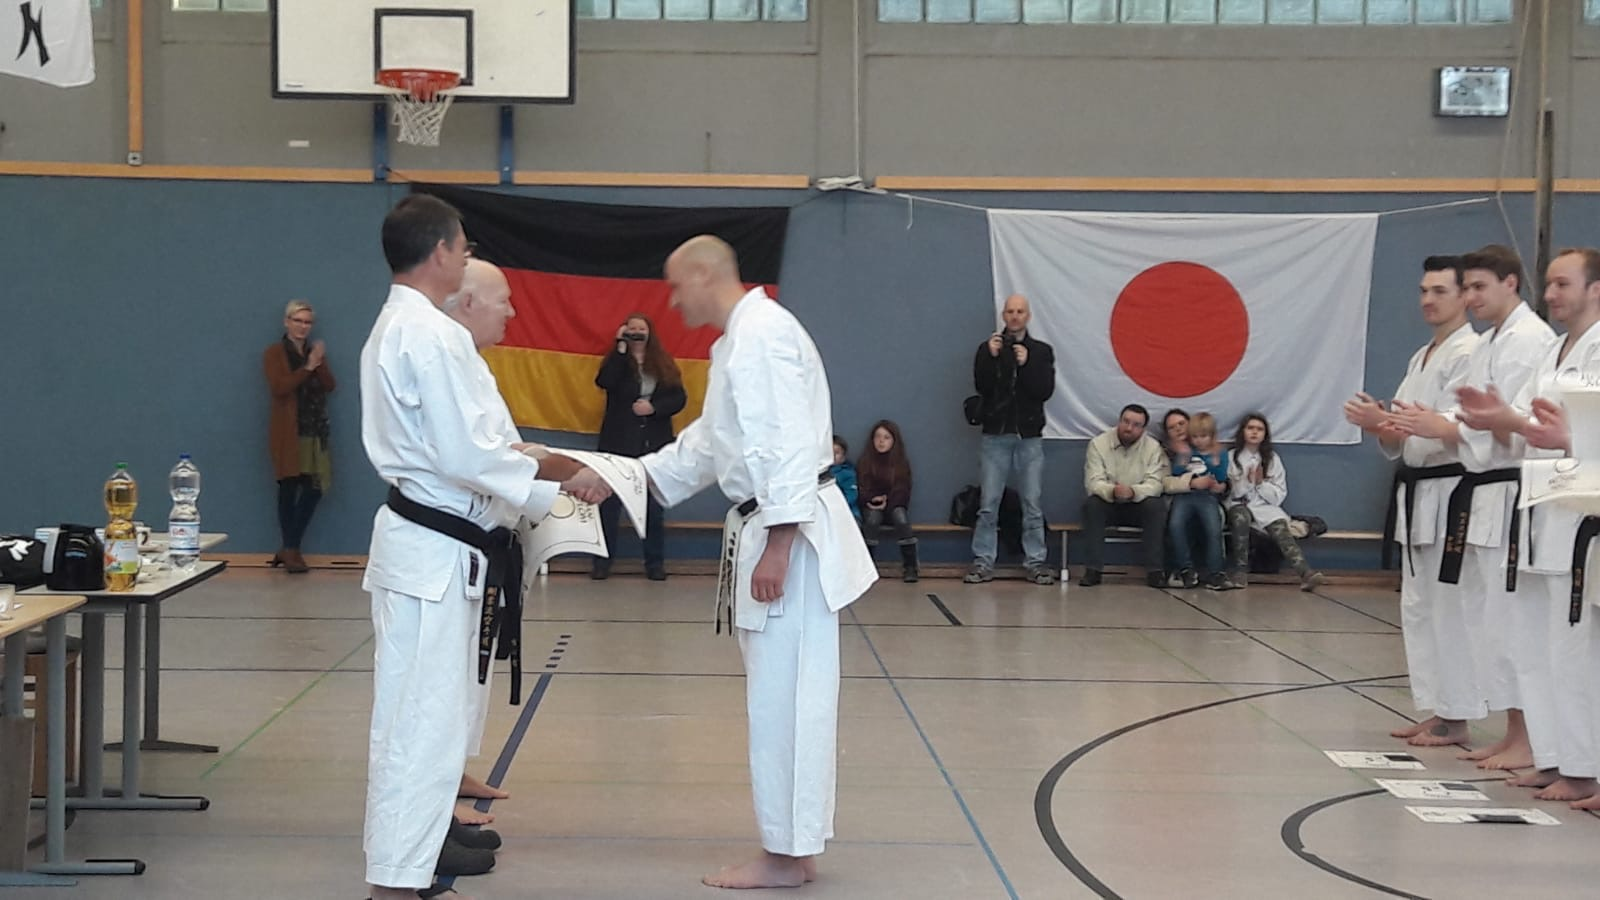 Karate Dan Prüfung von René Roese in Waltrop am 11.November 2019